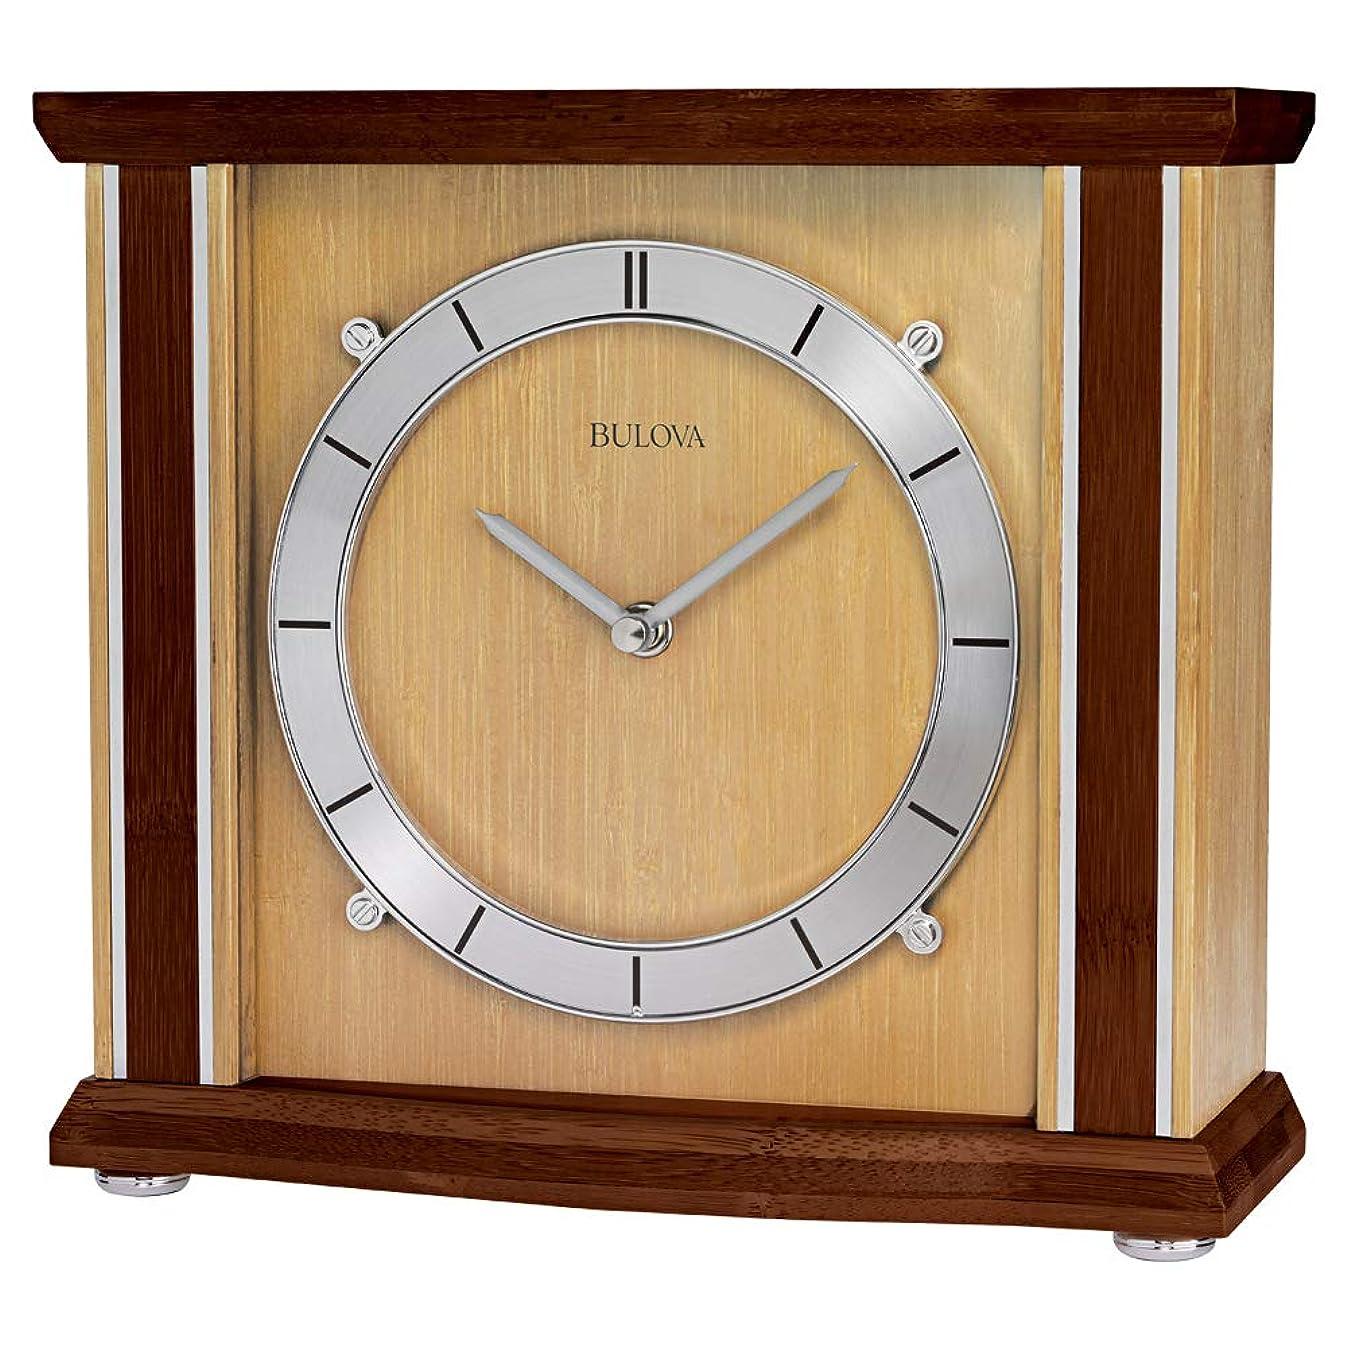 Bulova B1667 Emporia Tabletop Clock, Walnut and Natural Finish